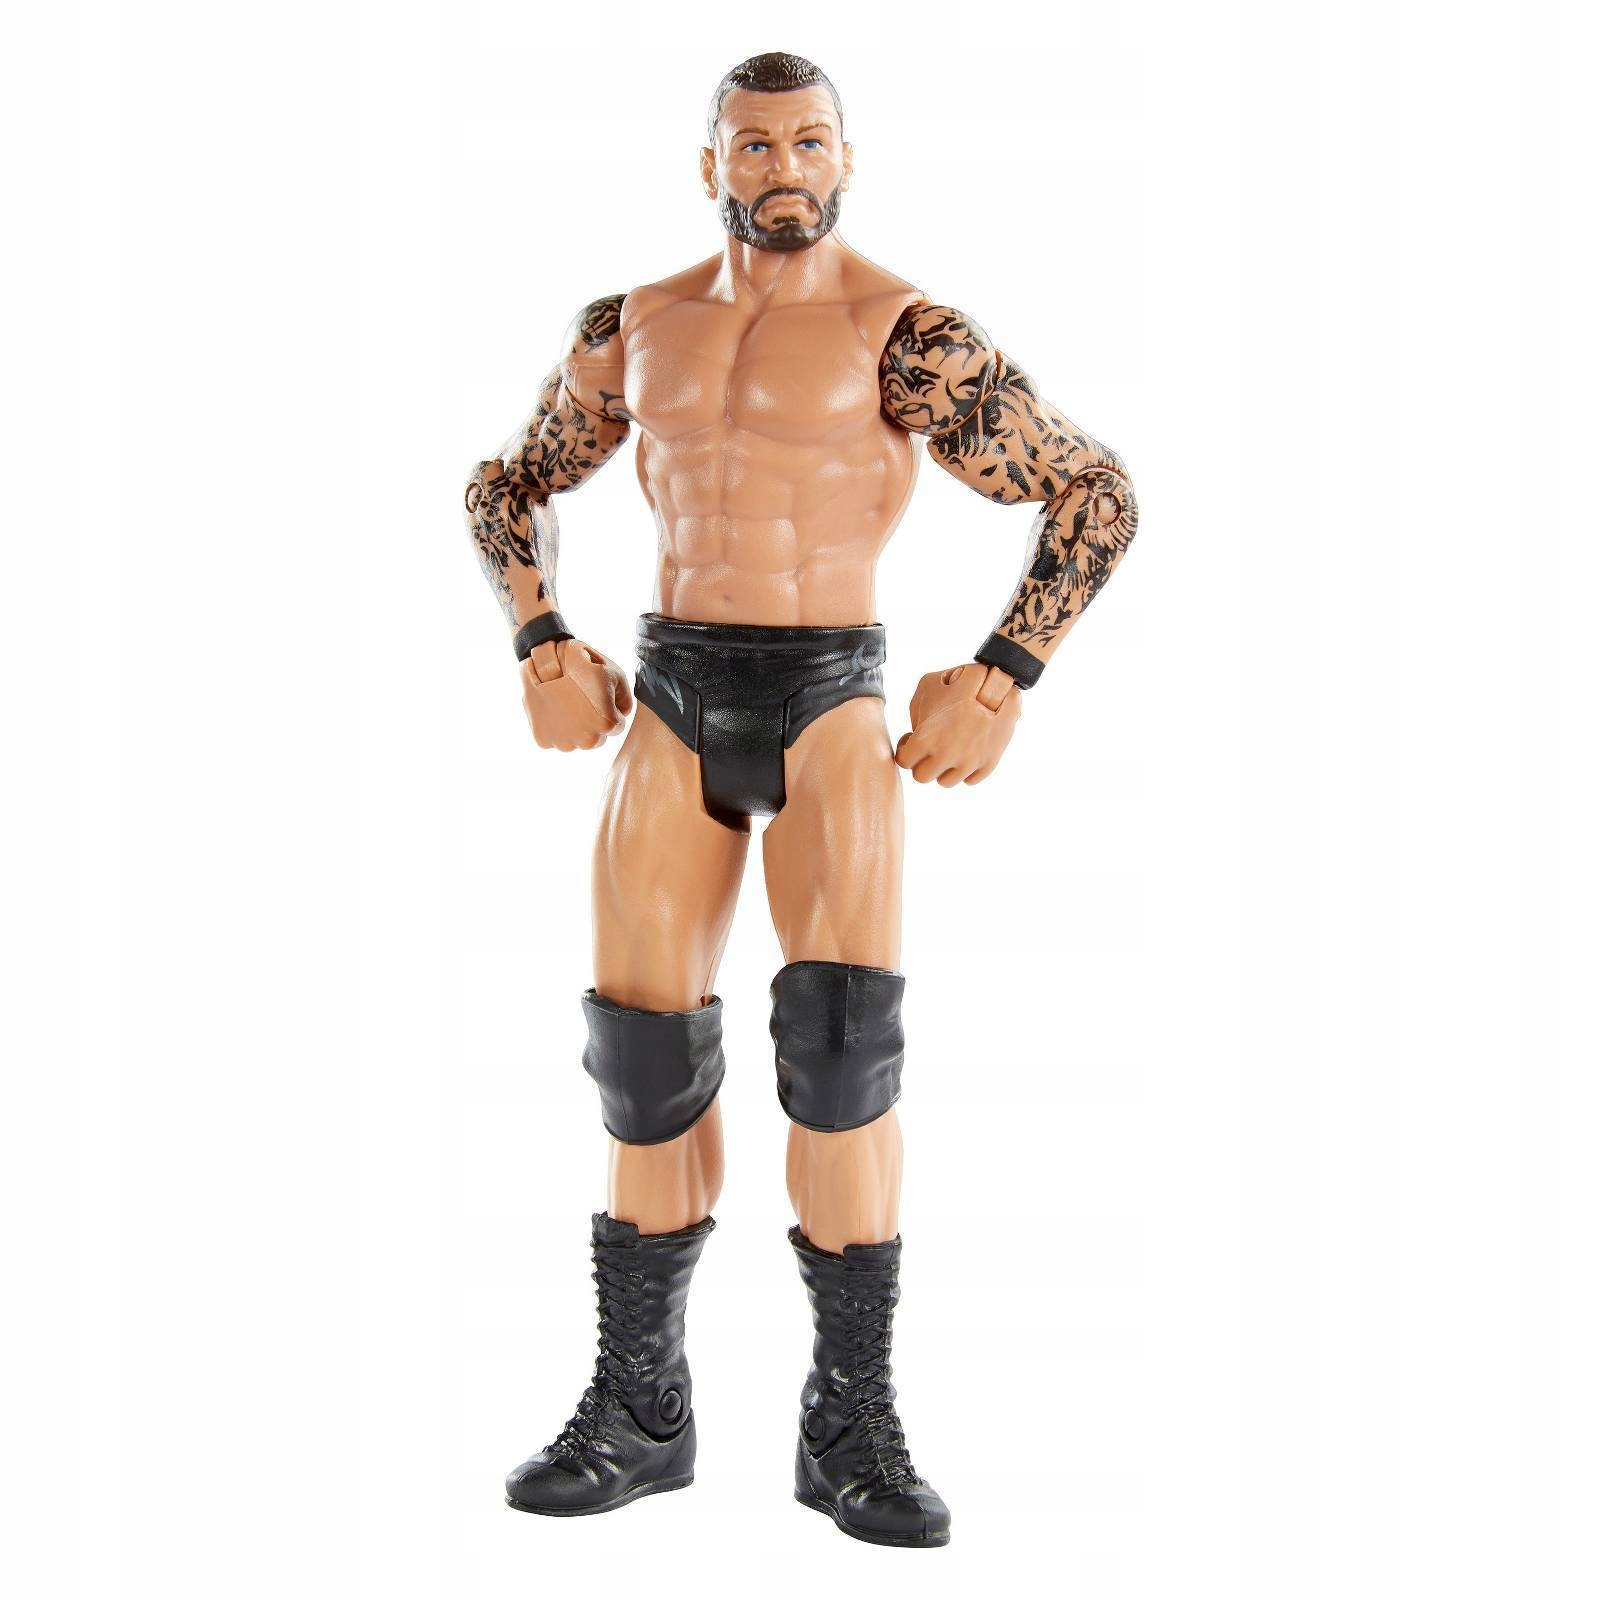 Wwe Randy Orton Superstar 57 Figurka Zapasnik